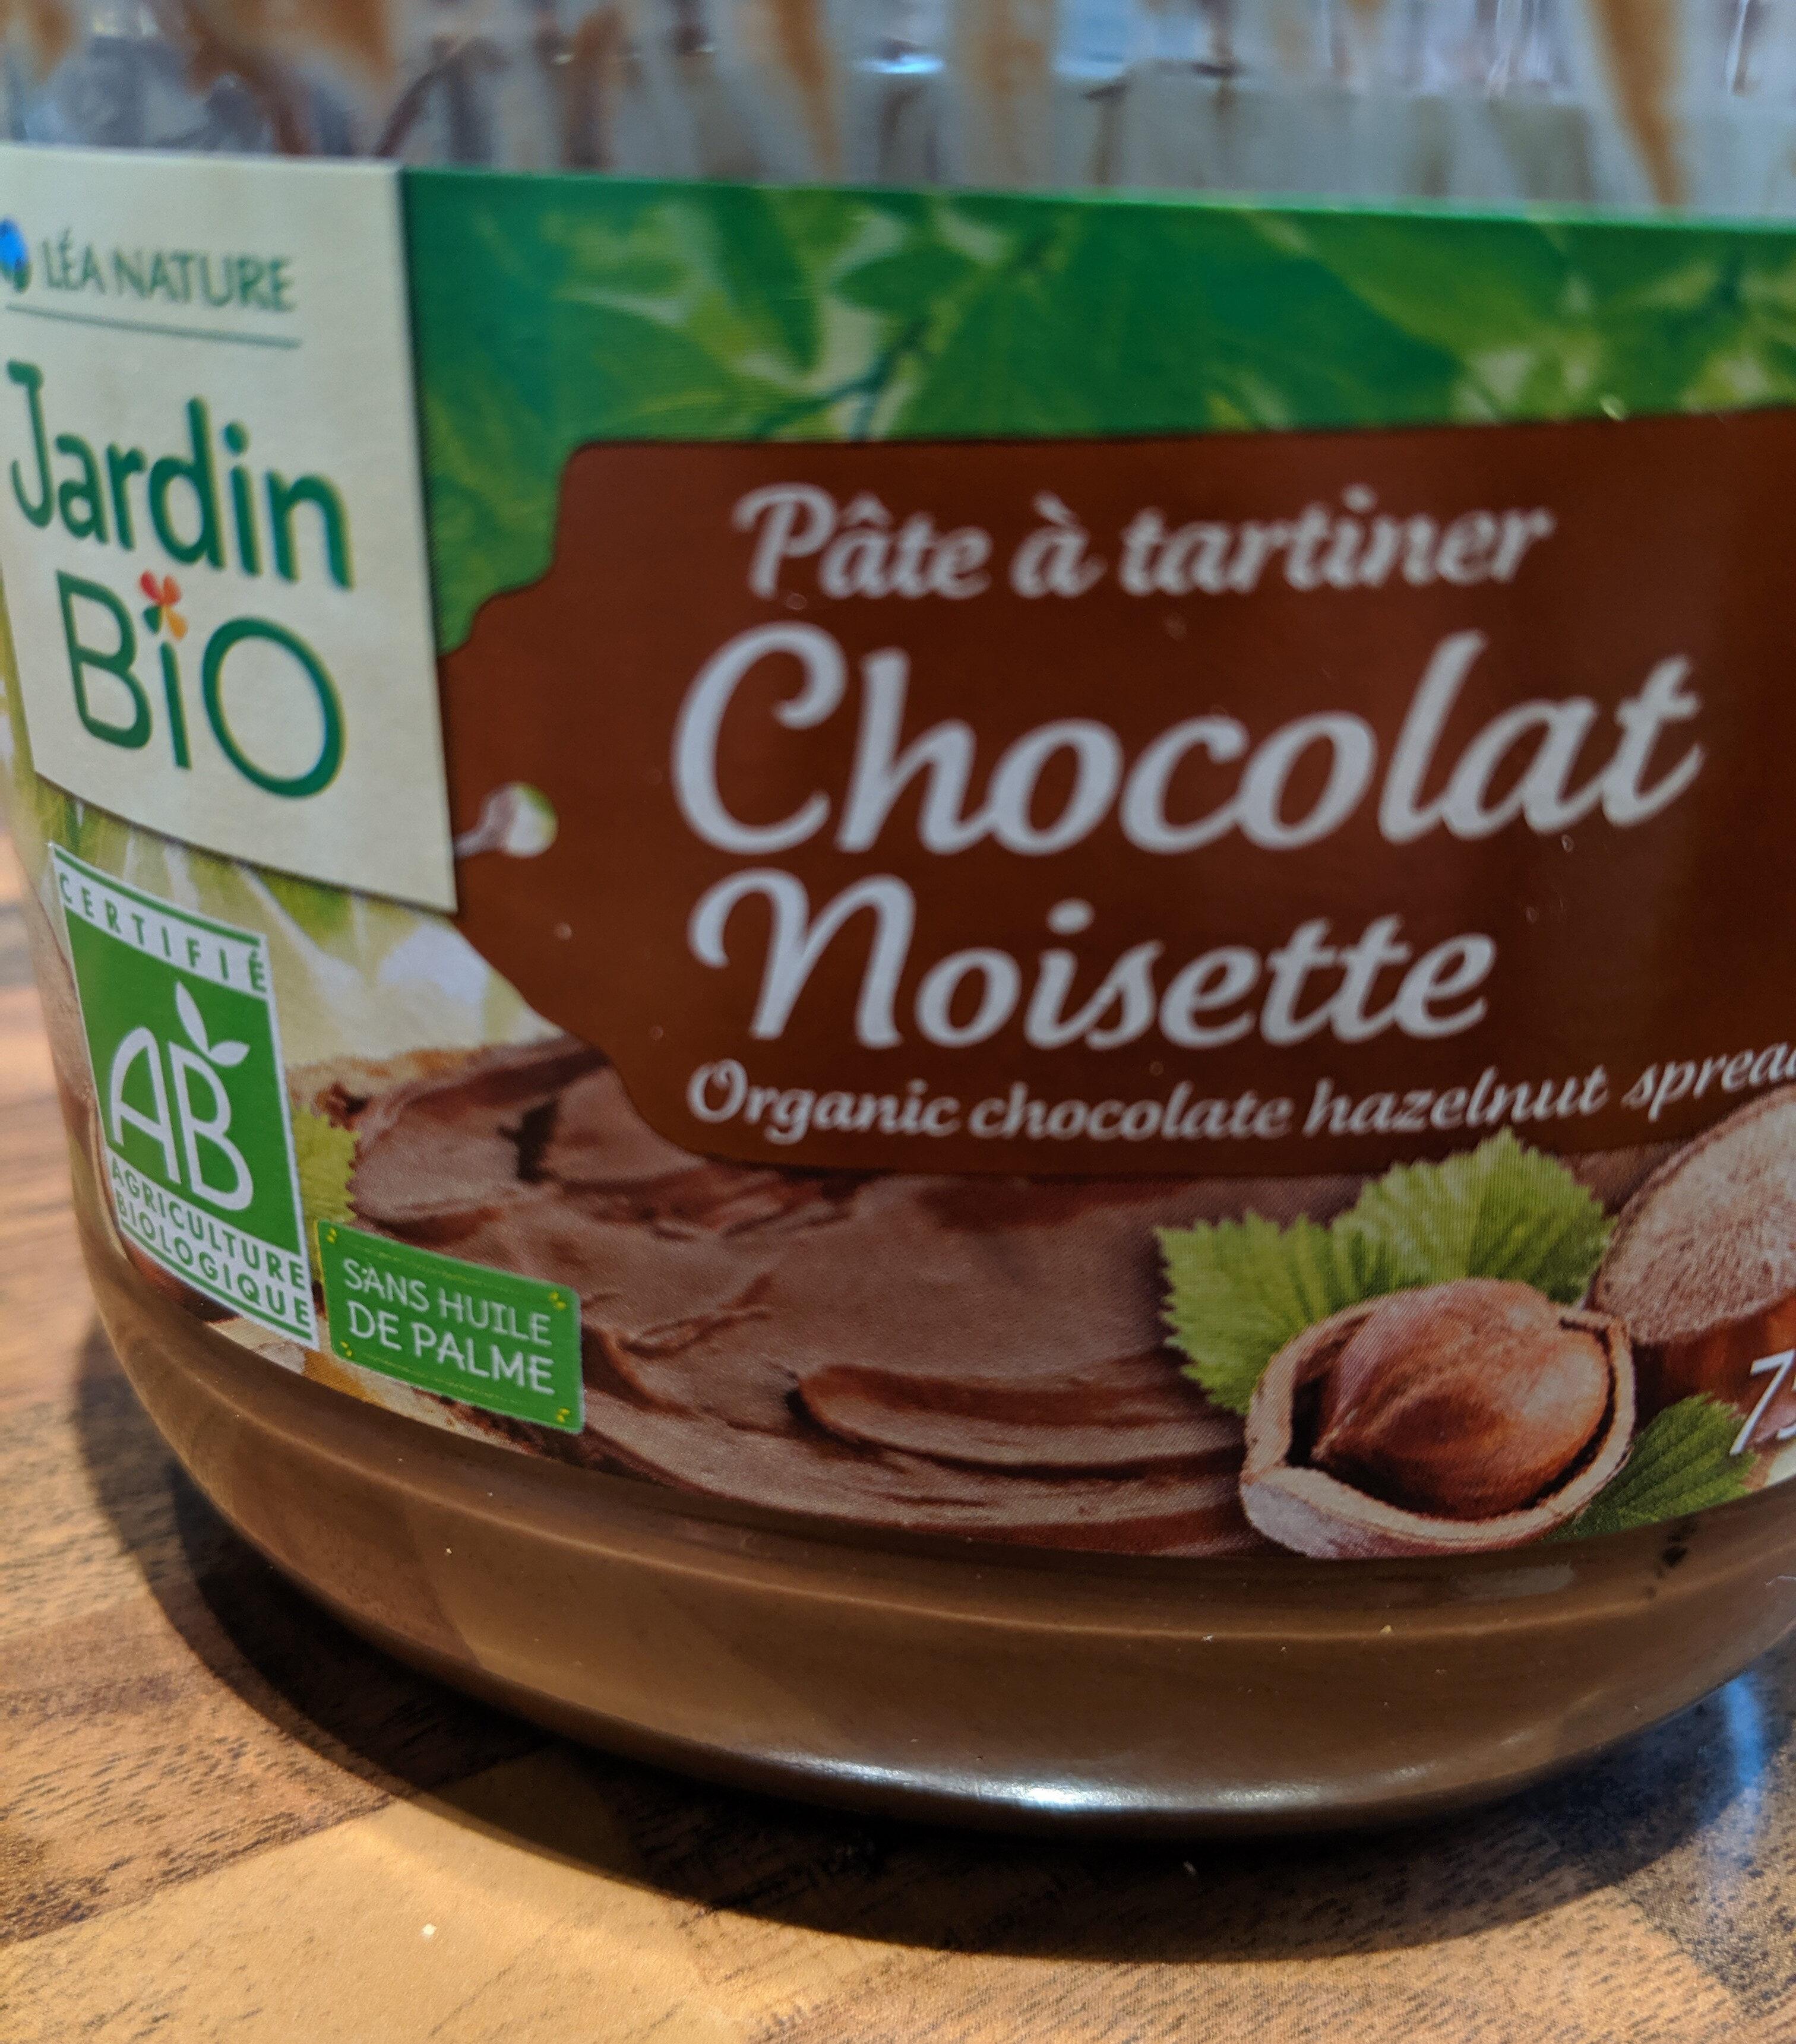 Pâte à tartiner chocolat noisette - Jardin bio - Product - fr